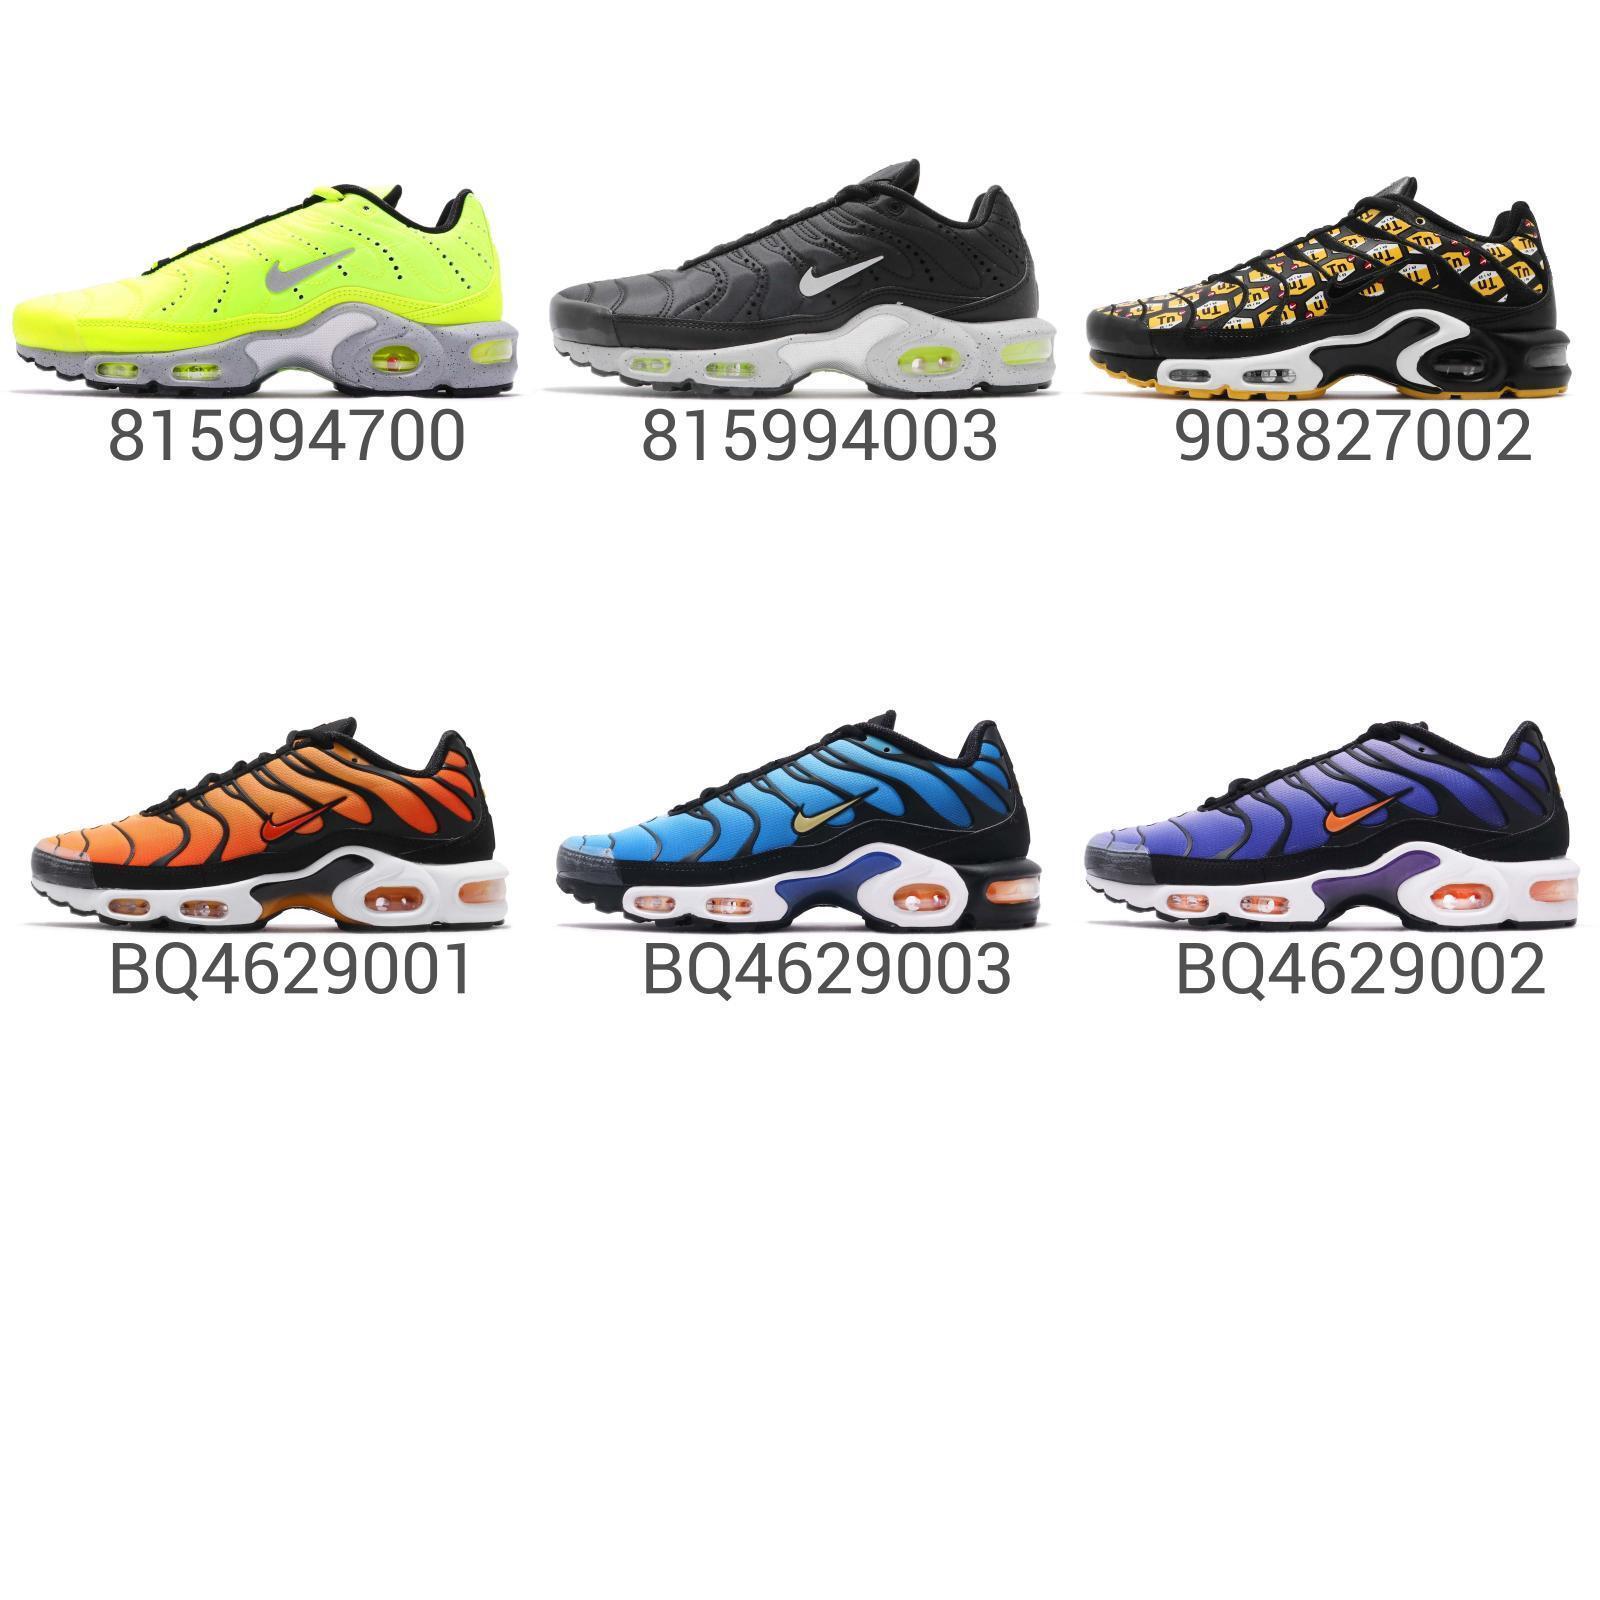 Nike Air Max Plus PRM   NS Retro Retro Retro Classic Men Running scarpe scarpe da ginnastica Pick 1 eb17e2